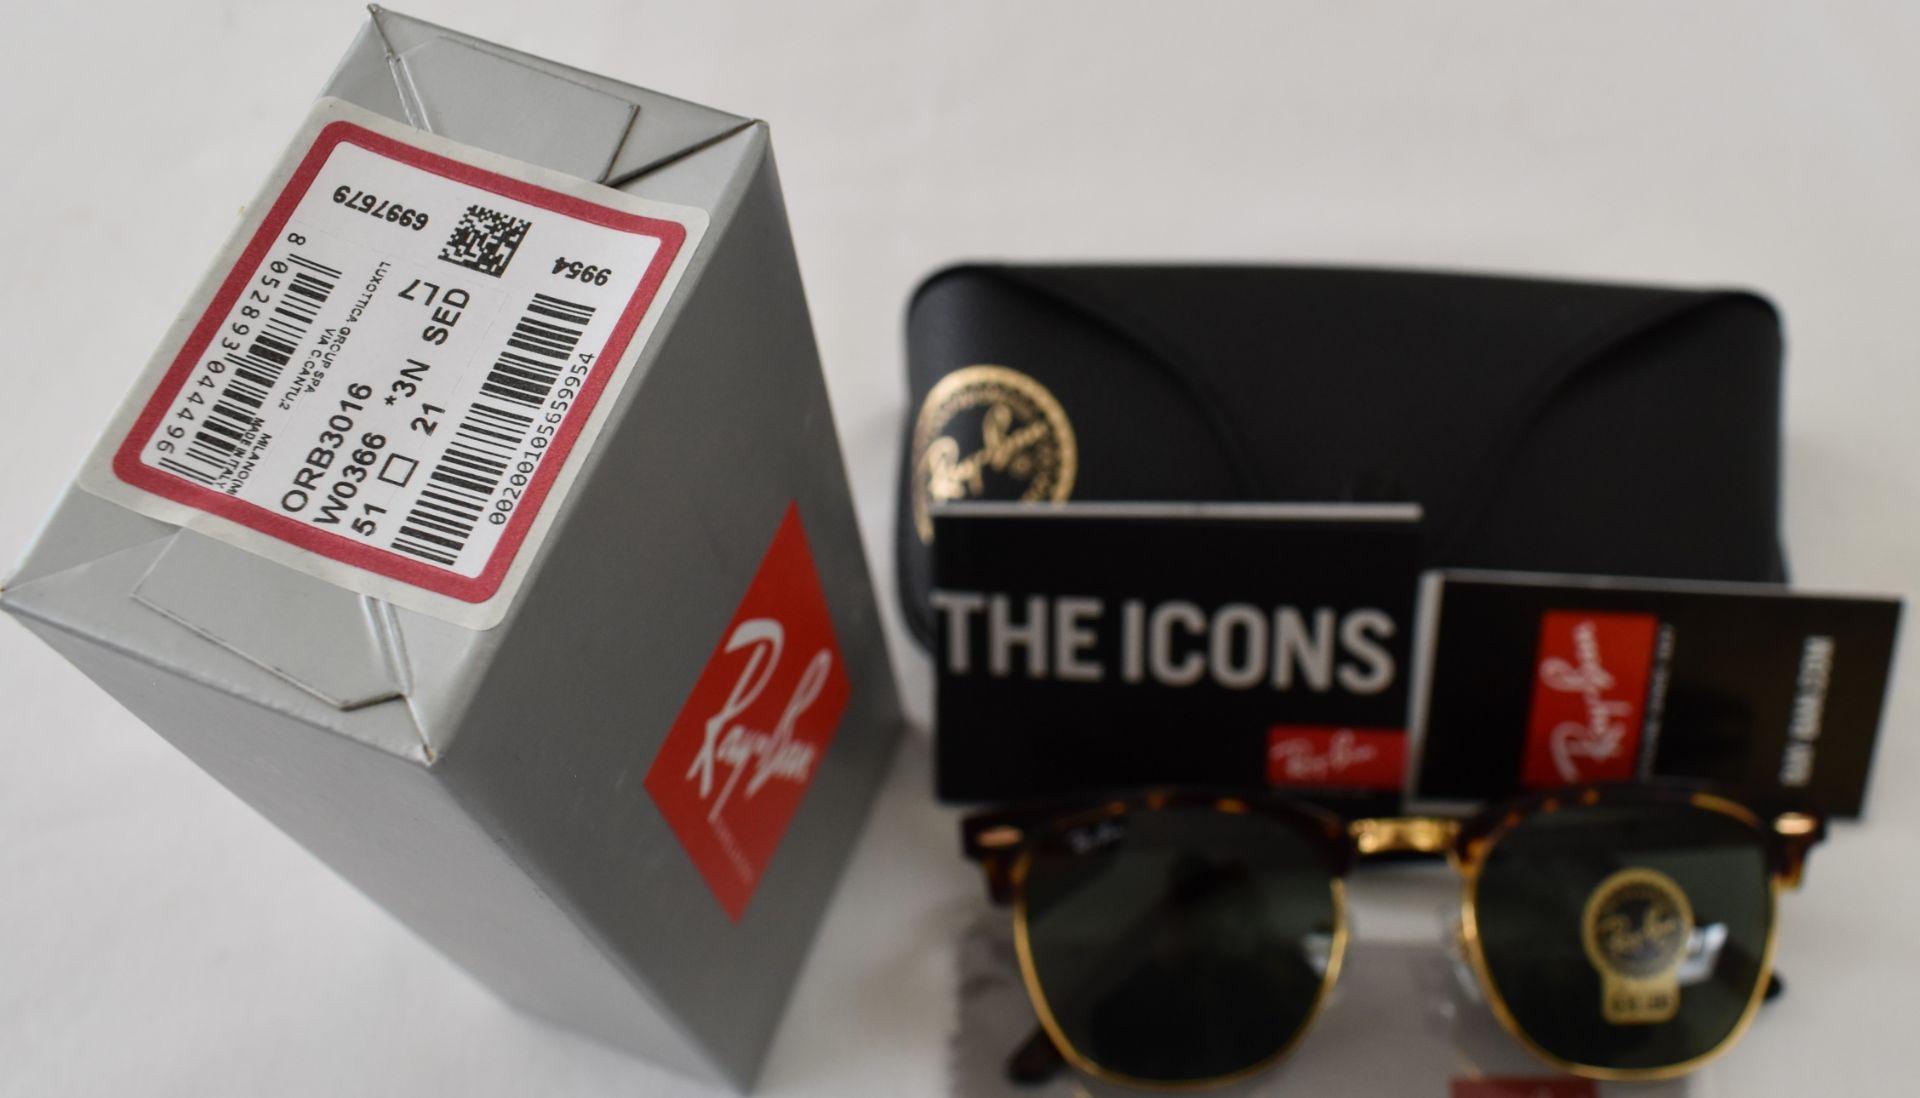 Ray Ban Sunglasses ORB3016 W0366 *3N - Image 3 of 3